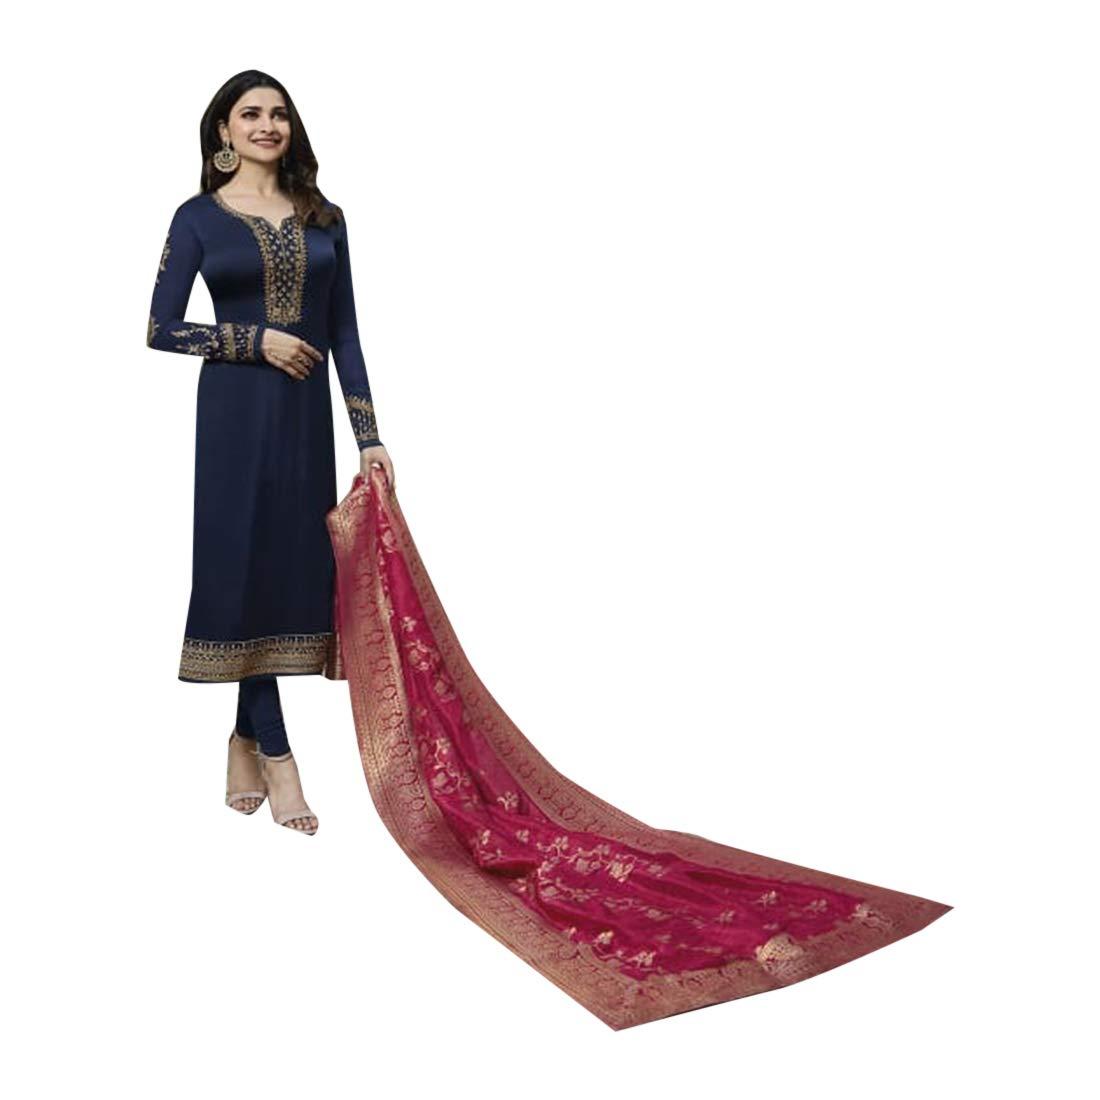 307f88f52d Amazon.com: Navy Blue Designer Festive wear Satin Georgette Salwar Kameez  Suit with Banarashi Dupatta Indian Women dress 7749: Clothing